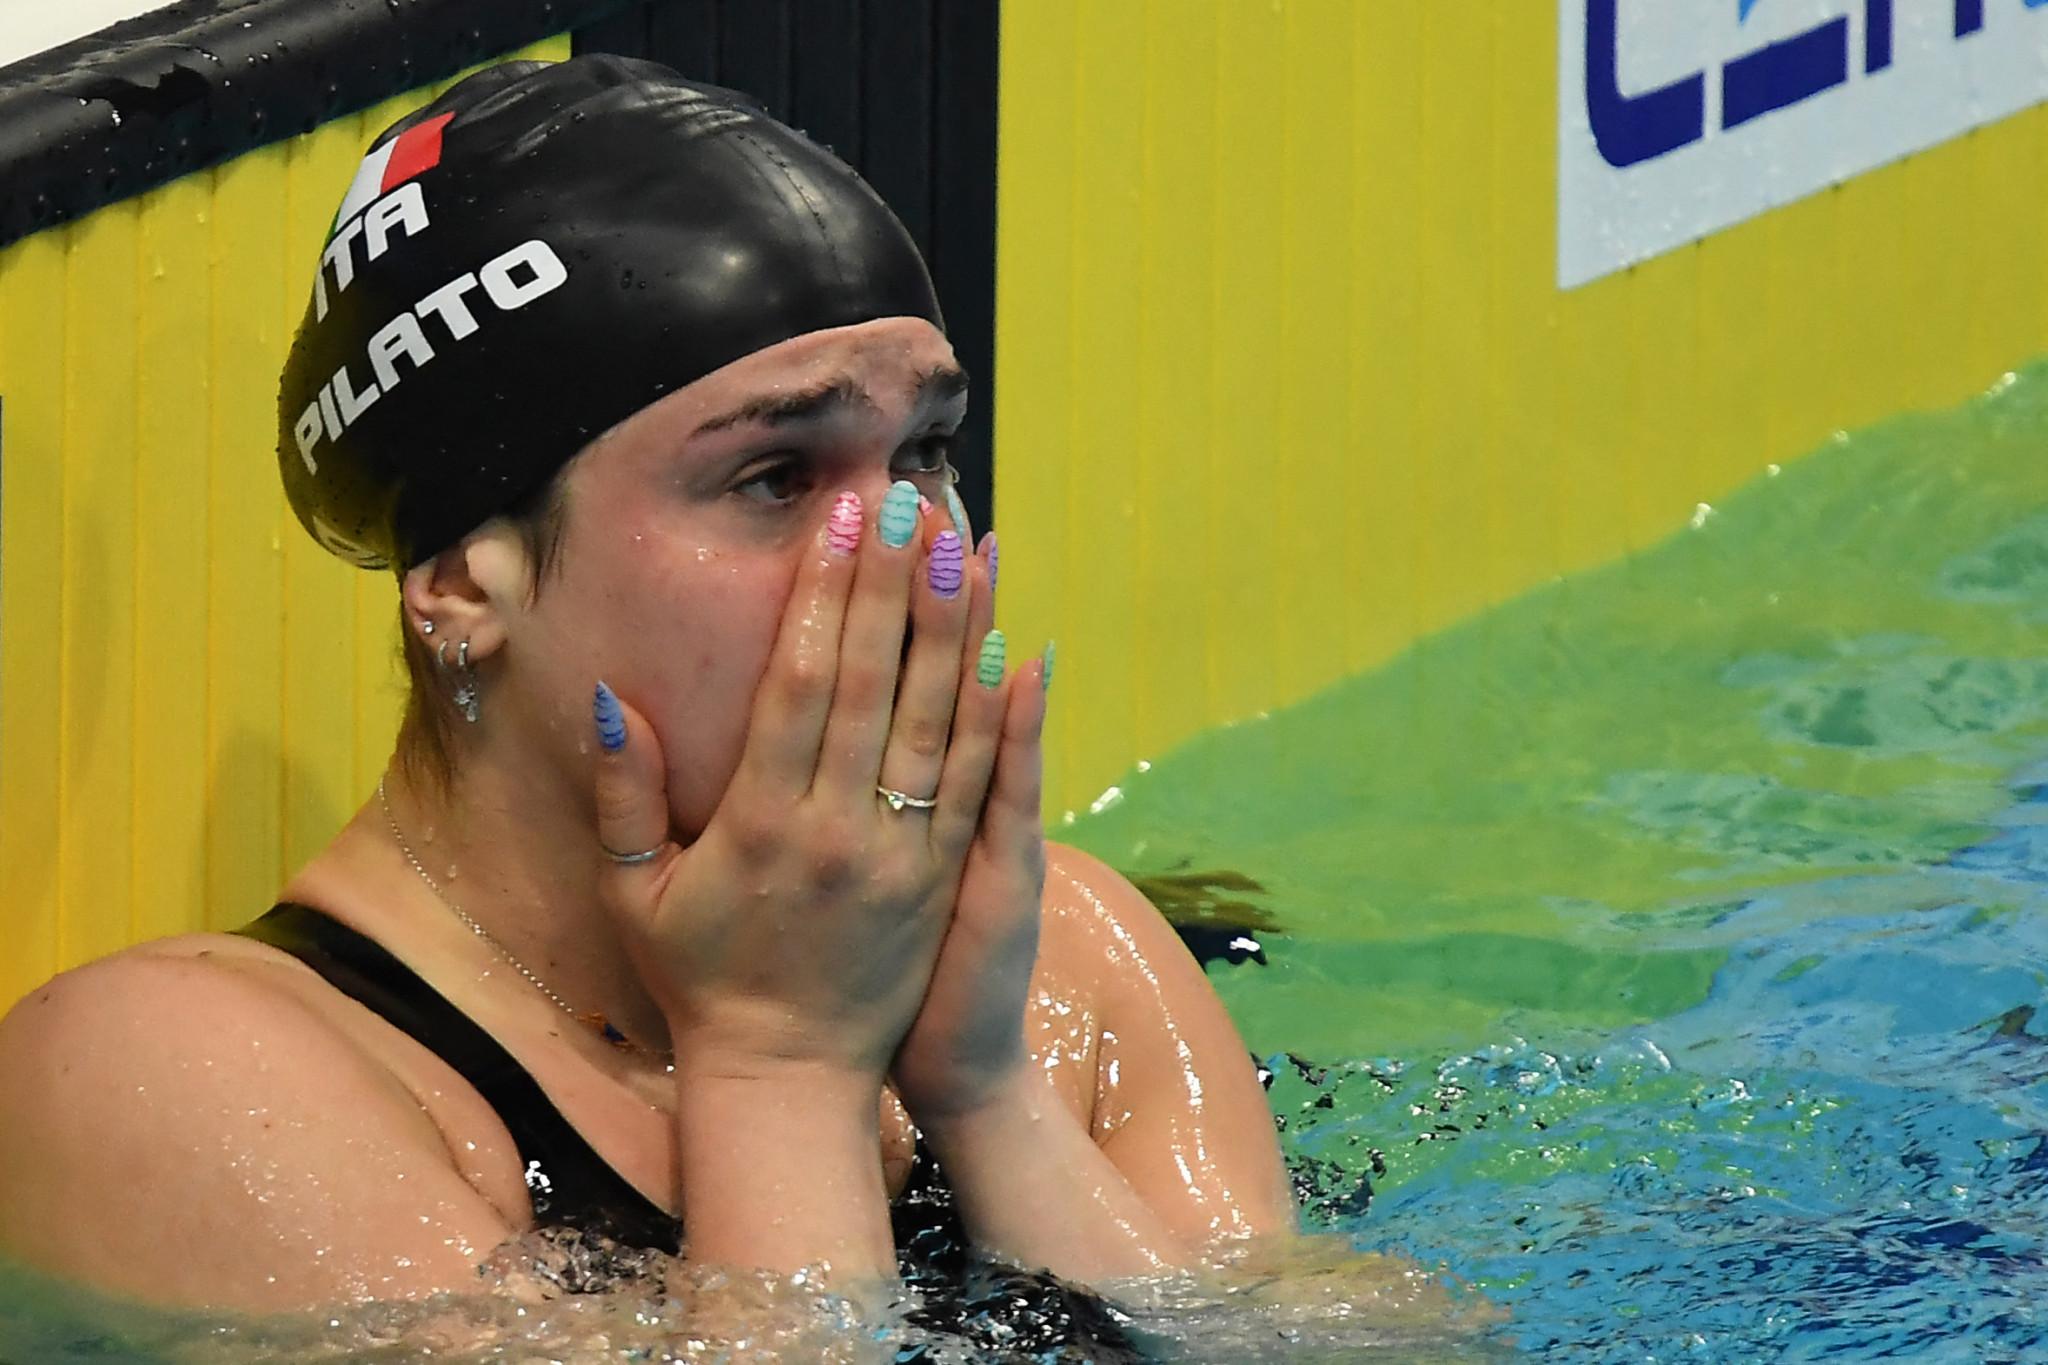 Pilato breaks 50m breaststroke world record at European Aquatics Championships